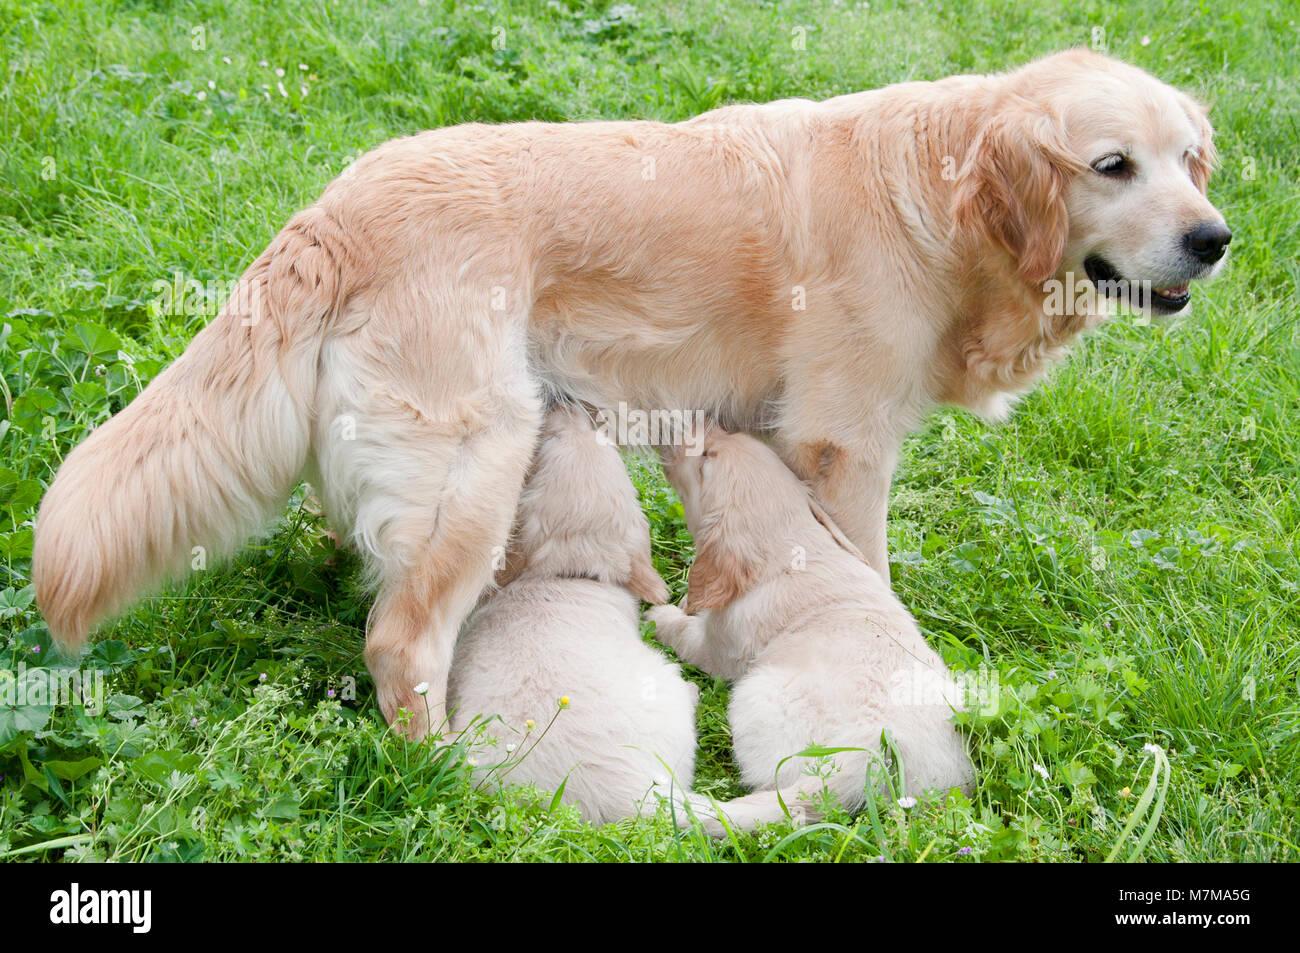 feeding two dog puppies - Stock Image